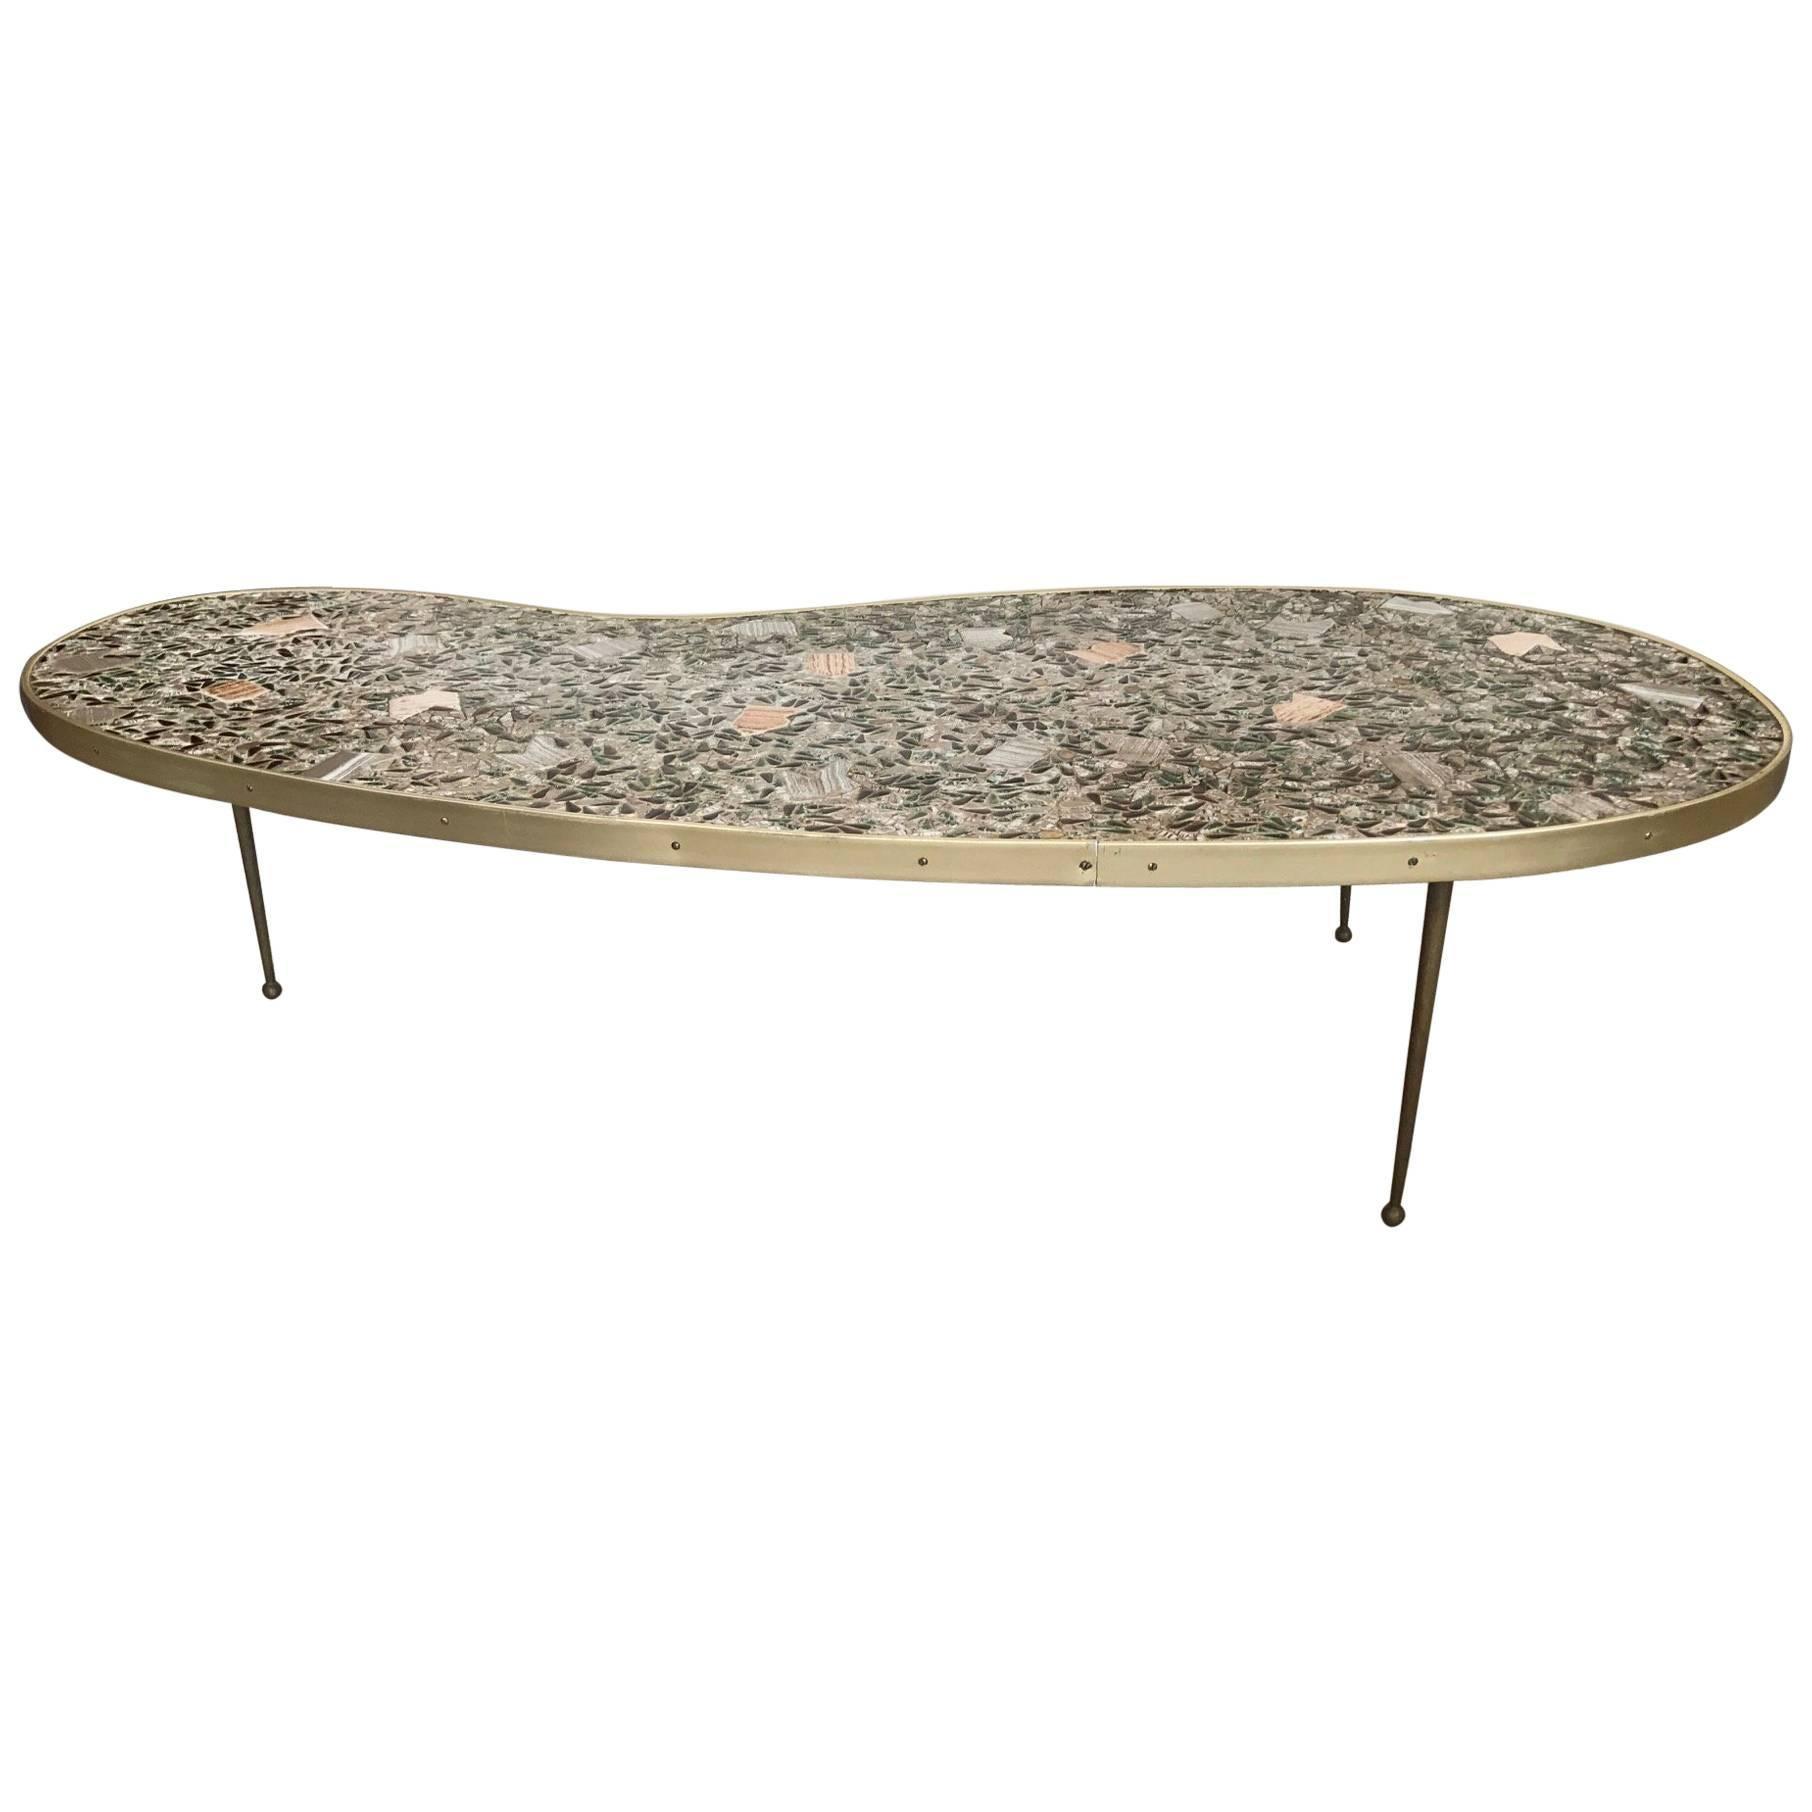 Merveilleux Unusual Tile Biomorphic Coffee Table